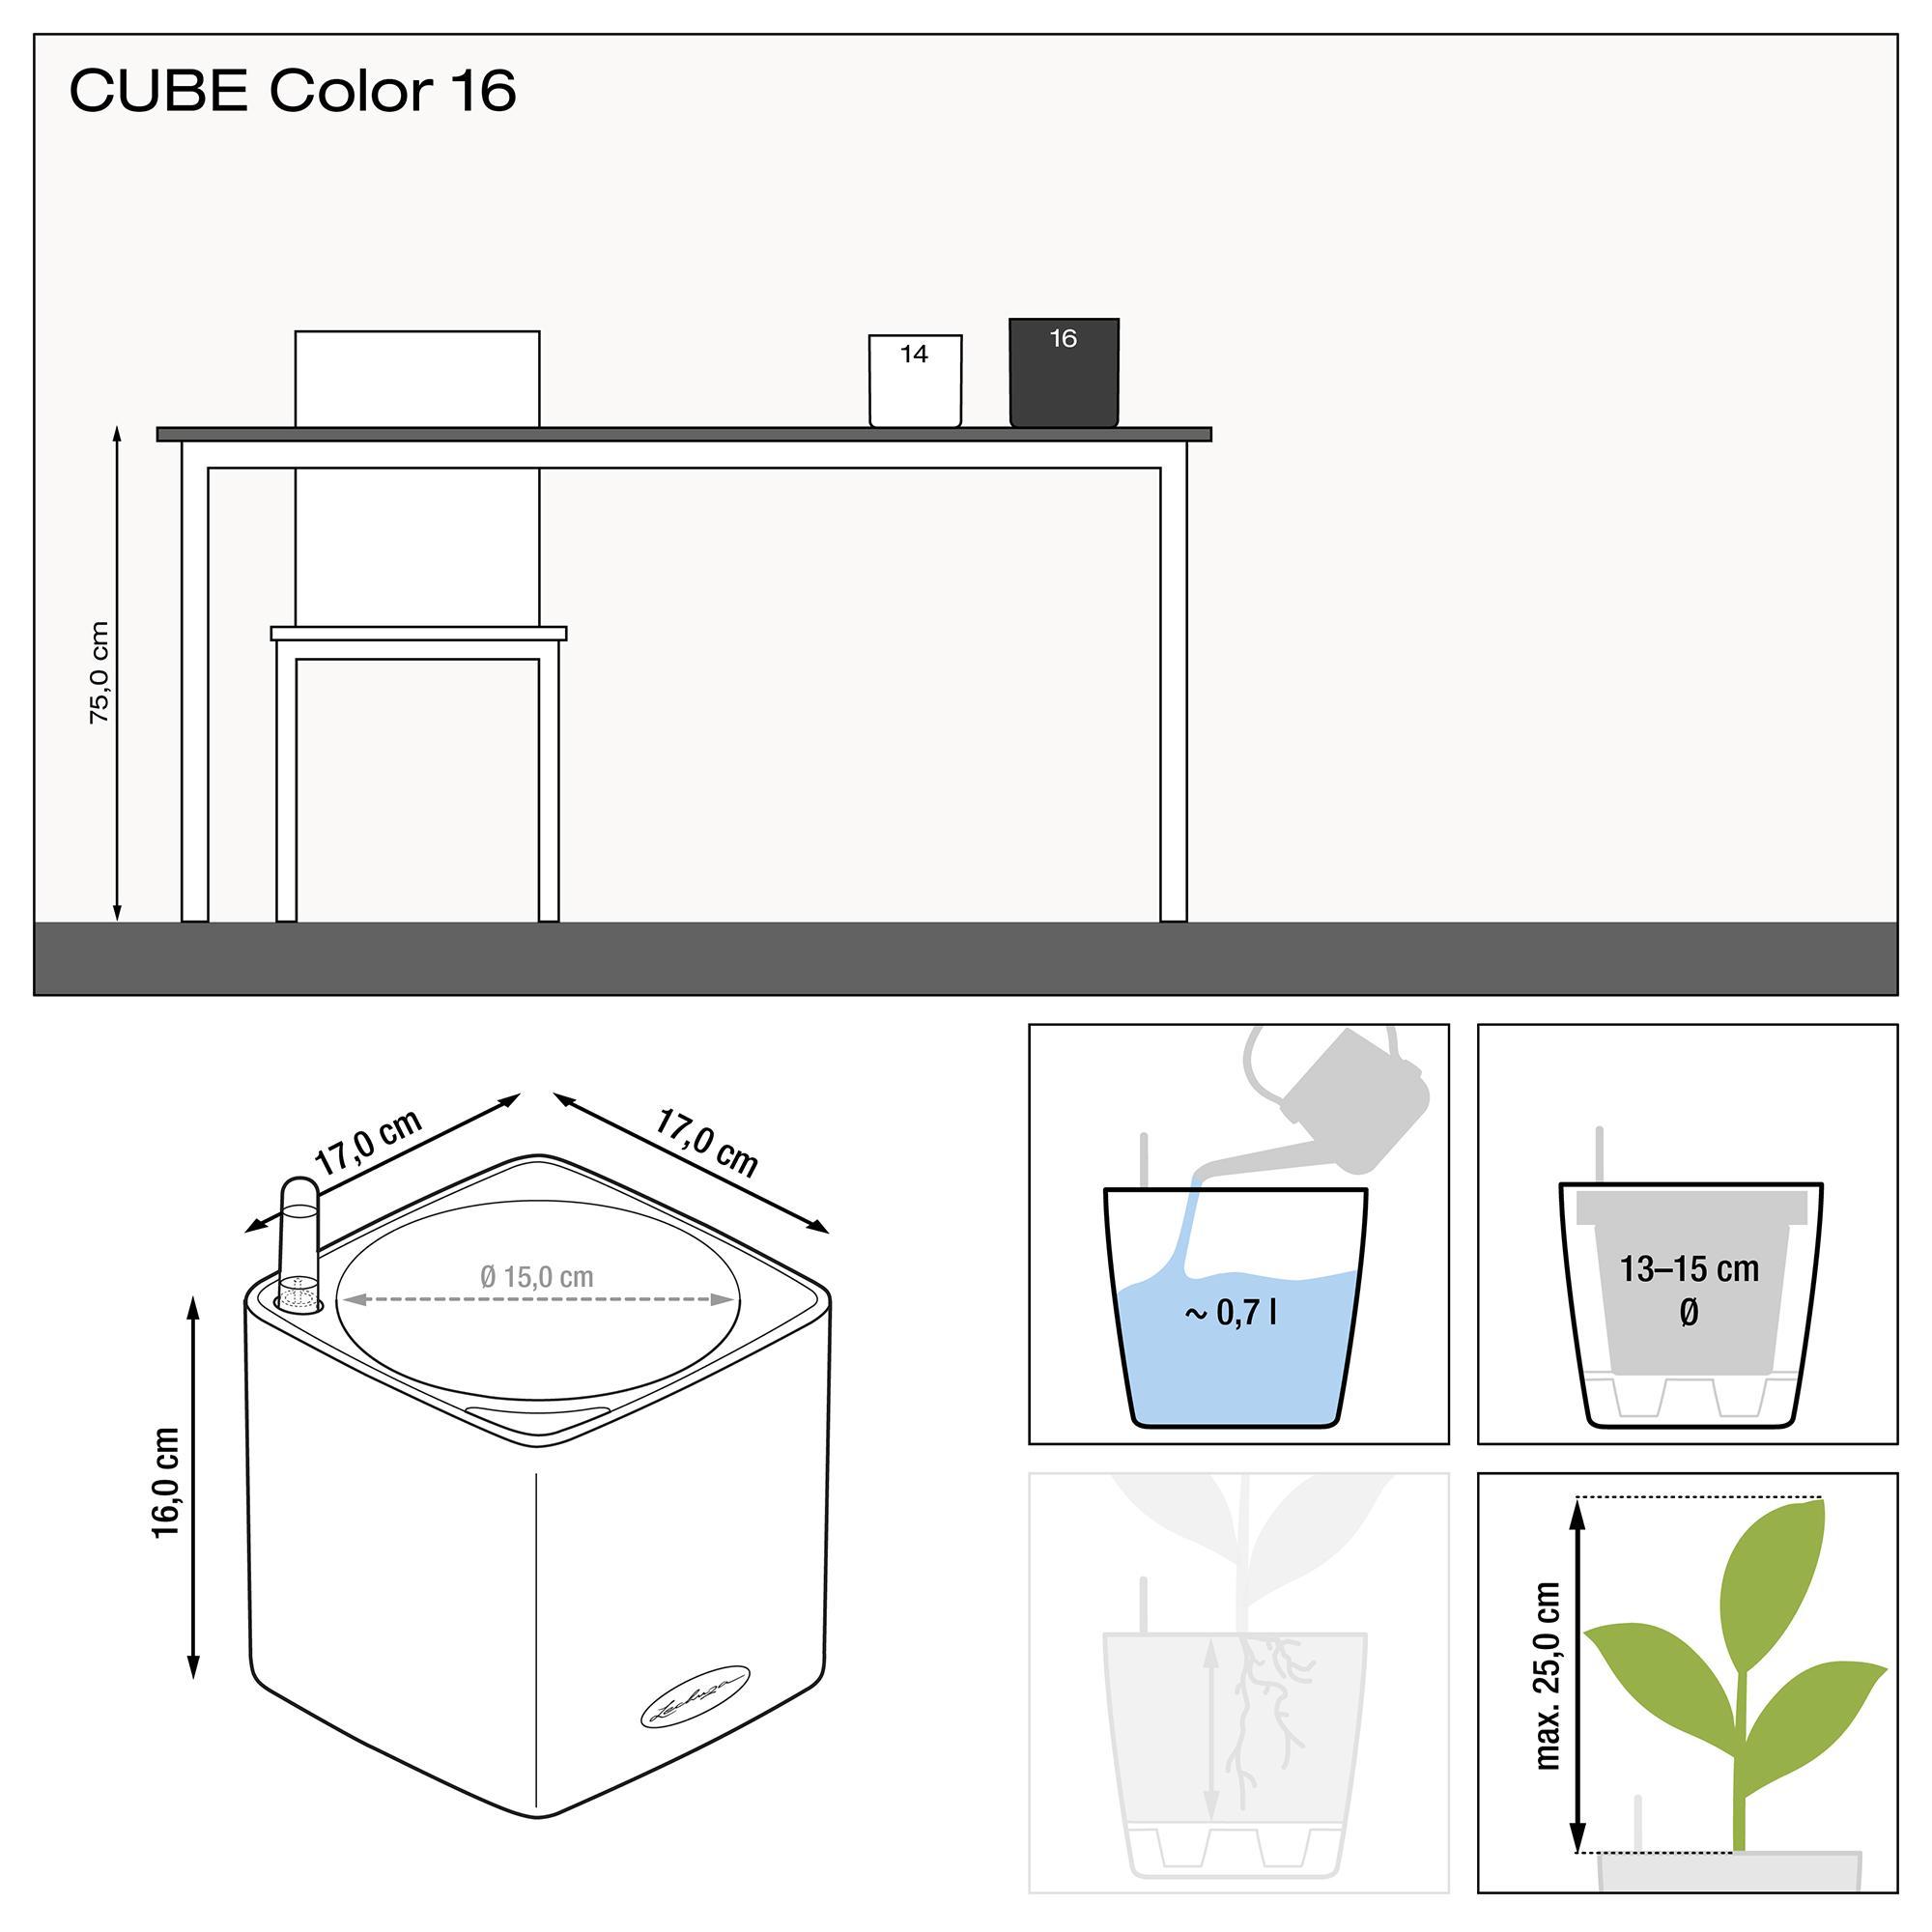 CUBE Color 16 white - Image 2